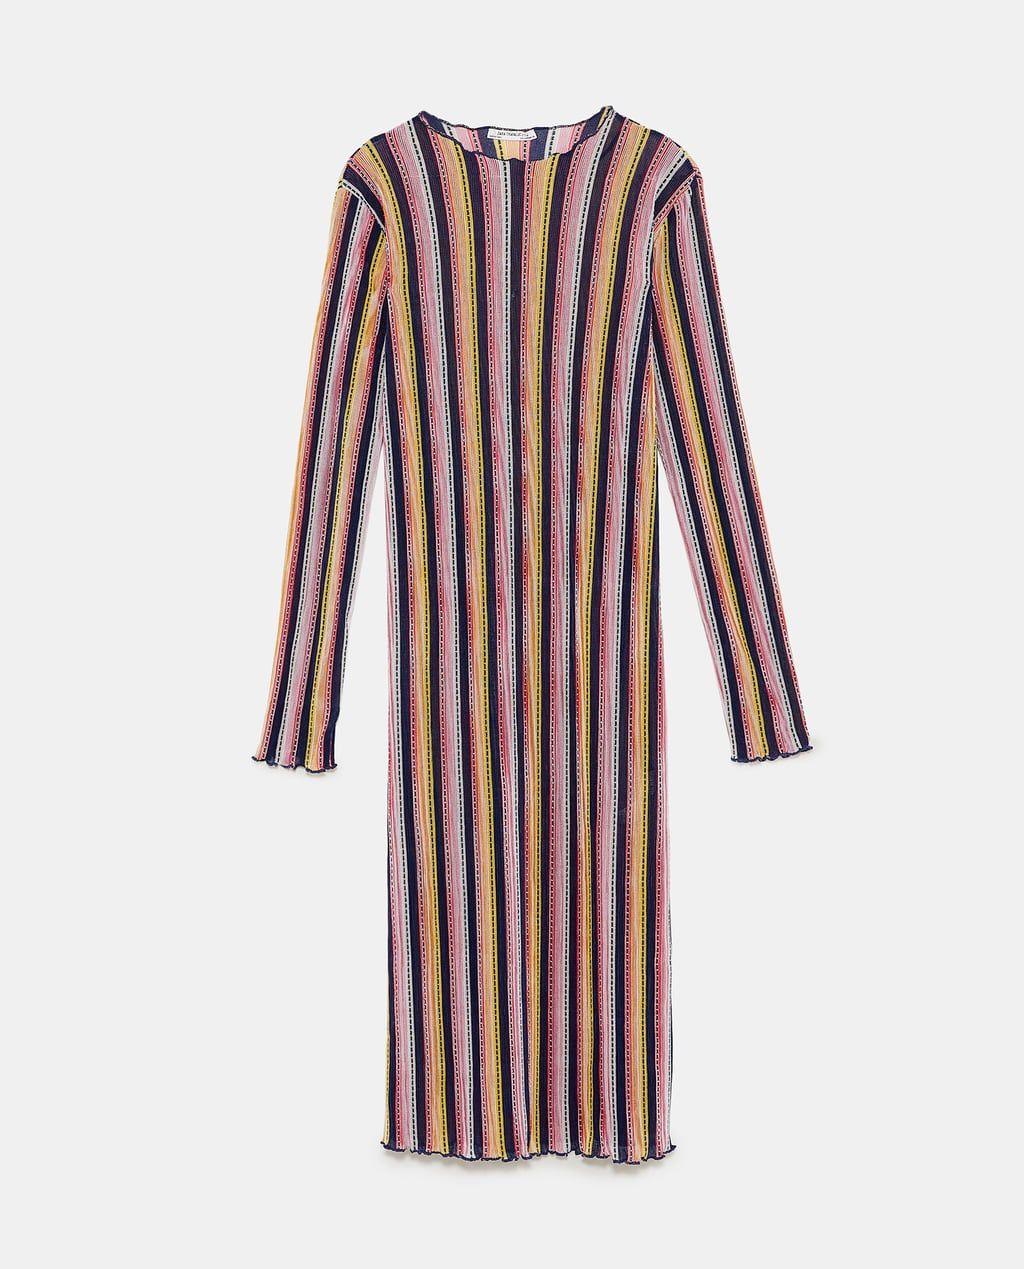 image 8 de robe plissÉe multicolore de zara | plissierte